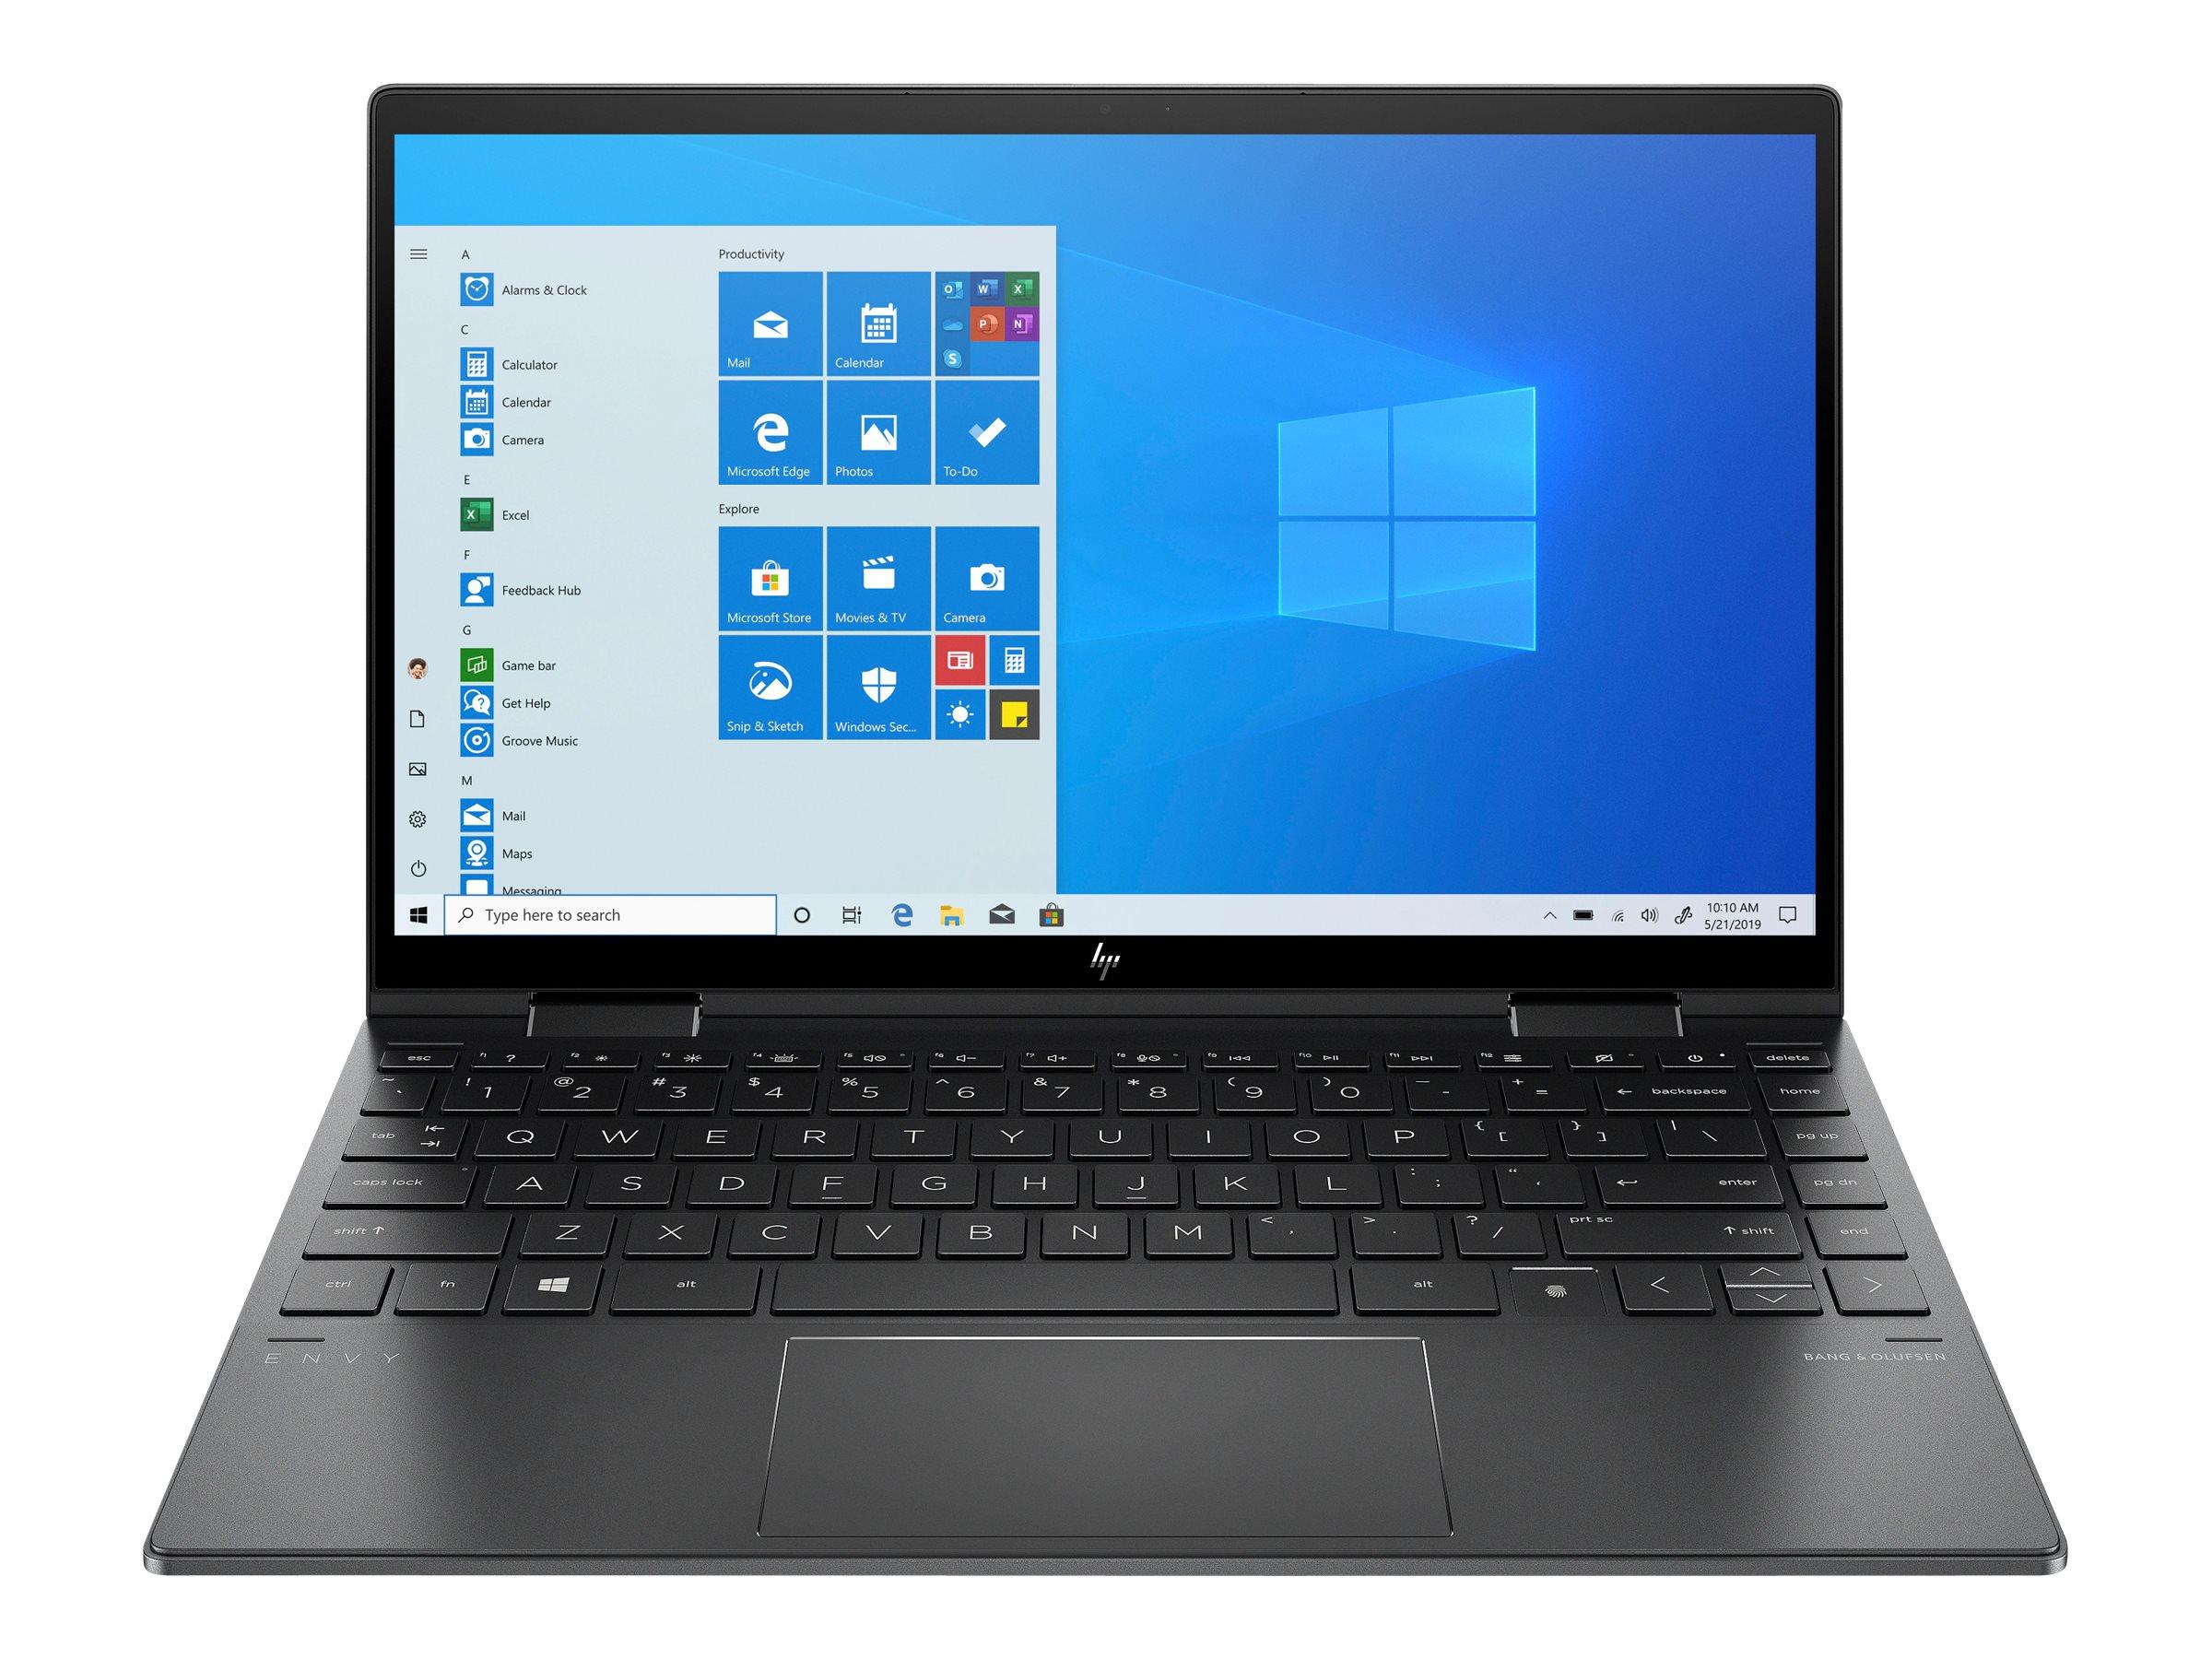 HP ENVY x360 13-ay0472ng - Flip-Design - Ryzen 7 4700U / 2 GHz - Win 10 Home 64-Bit - 8 GB RAM - 256 GB SSD NVMe - 33.8